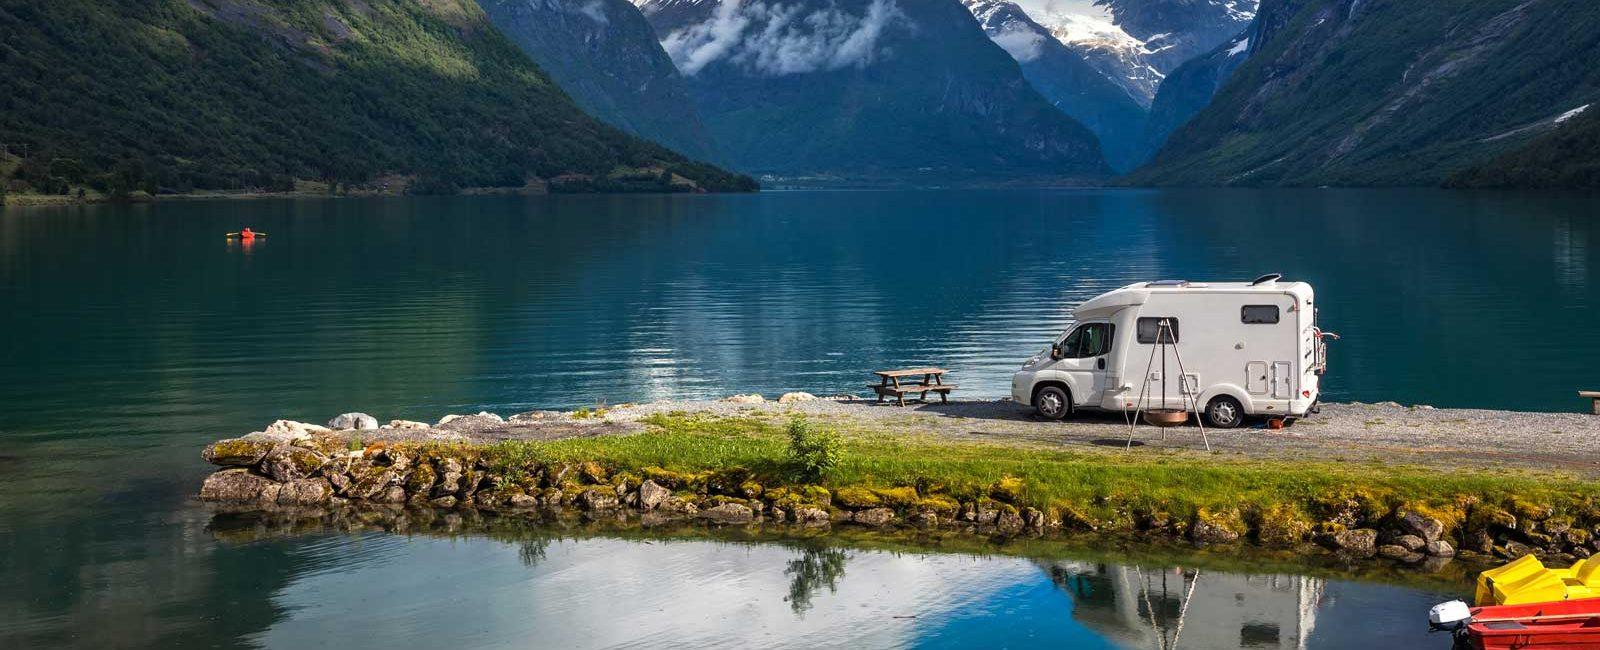 campassur sp cialiste de l 39 assurance camping car. Black Bedroom Furniture Sets. Home Design Ideas